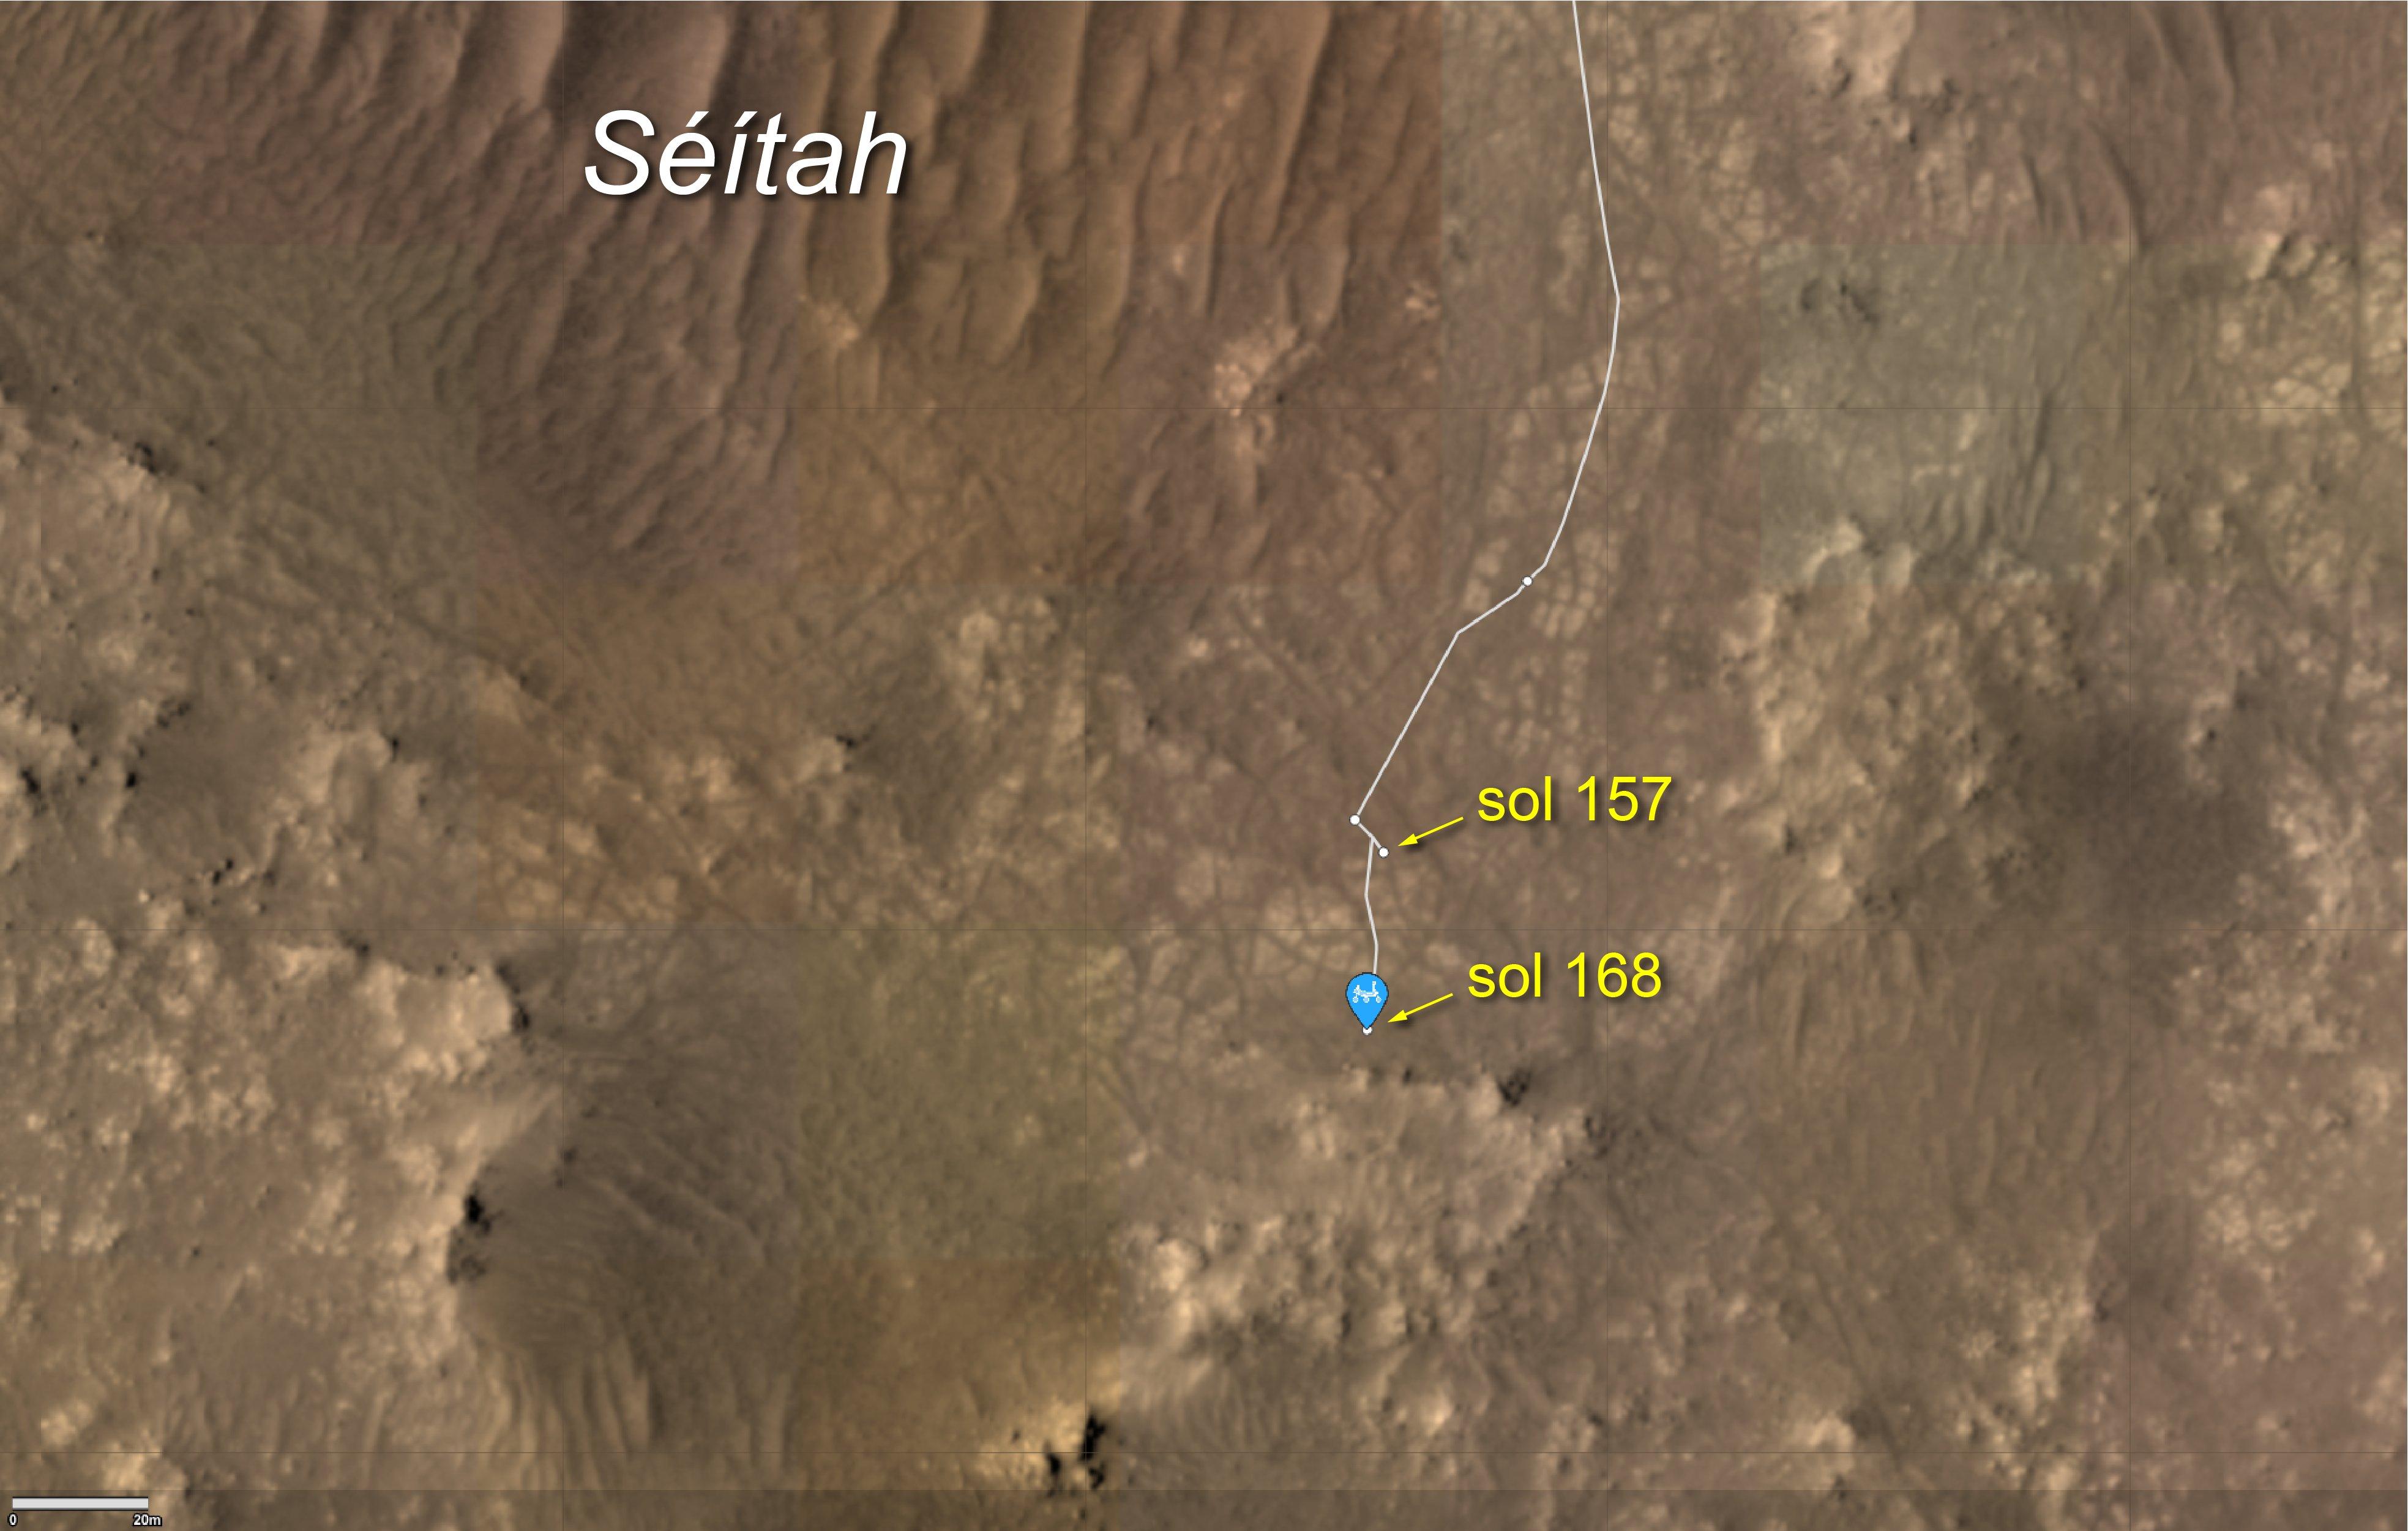 Mars 2020 (Perseverance - Ingenuity) : exploration du cratère Jezero - Page 20 12094